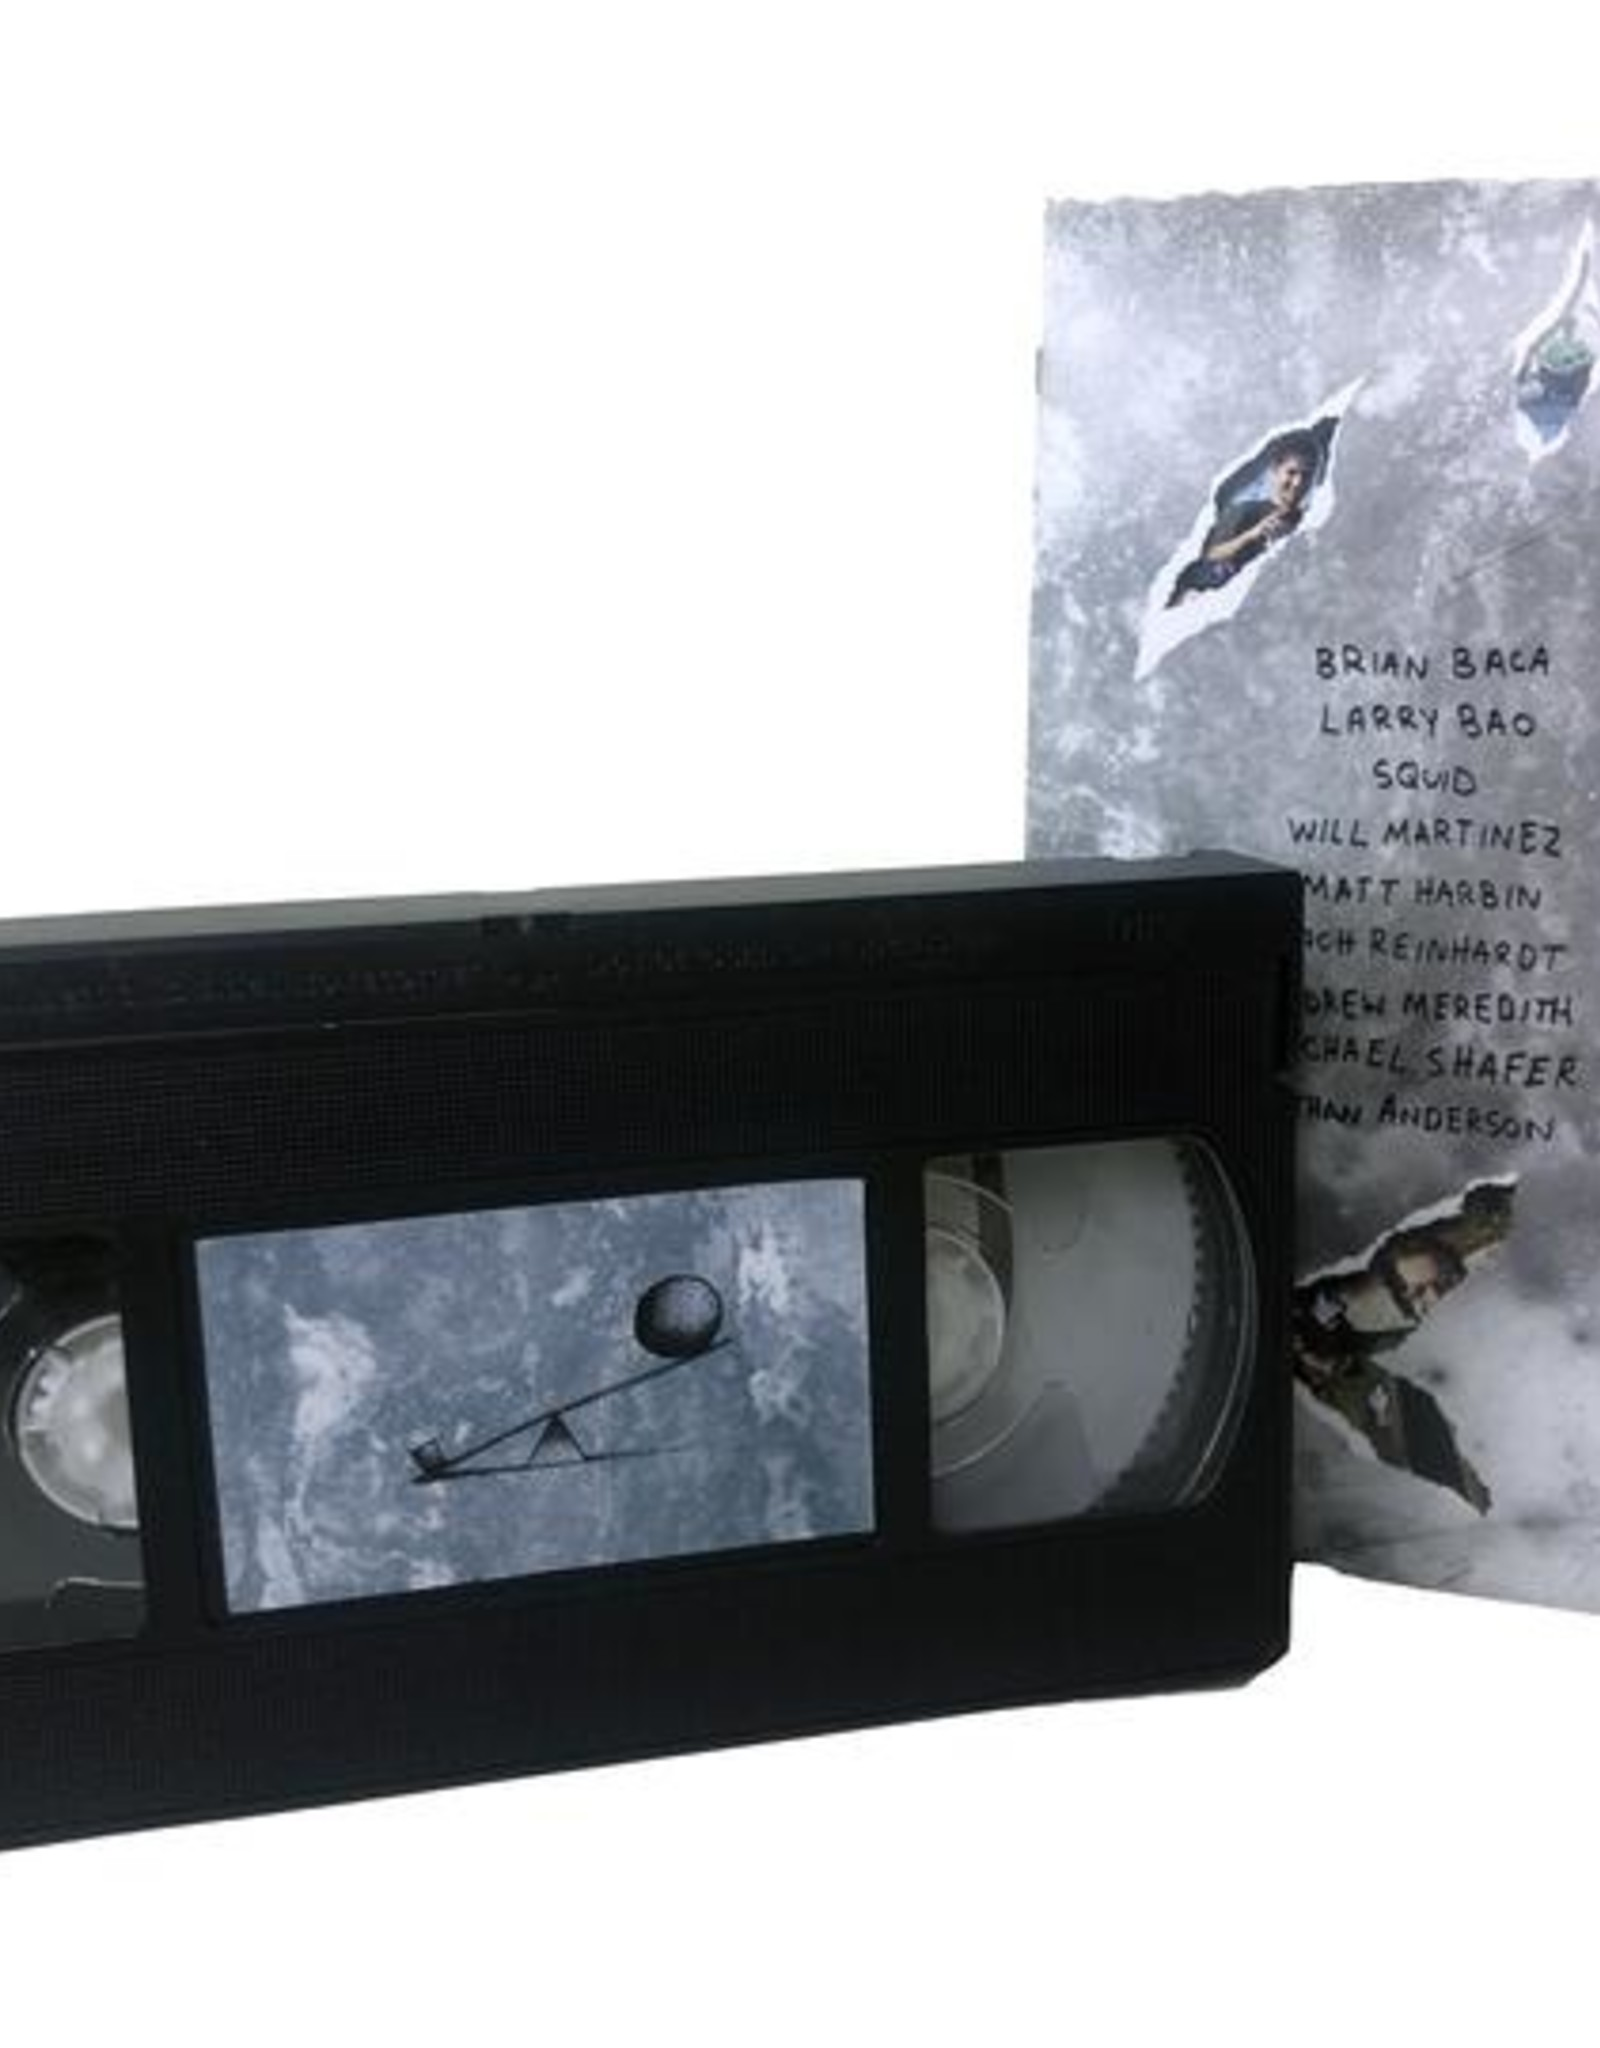 LESS THAN LOCAL LESS THAN LOCAL LESS IS MORE VHS